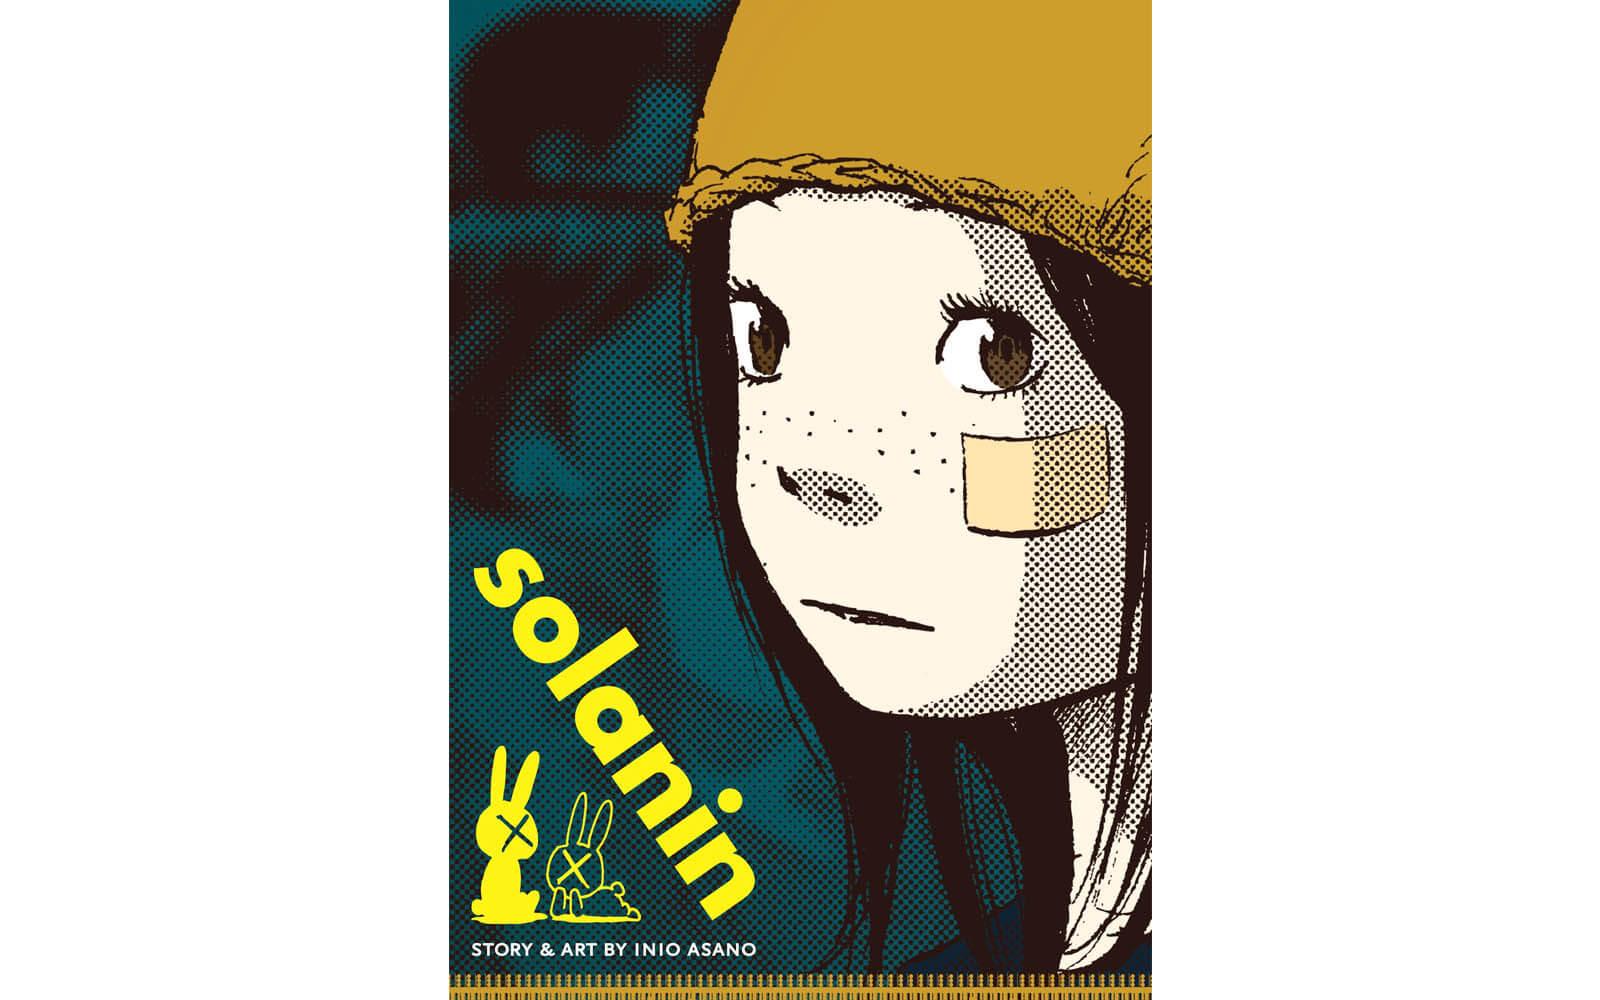 Solanin Manga Cover